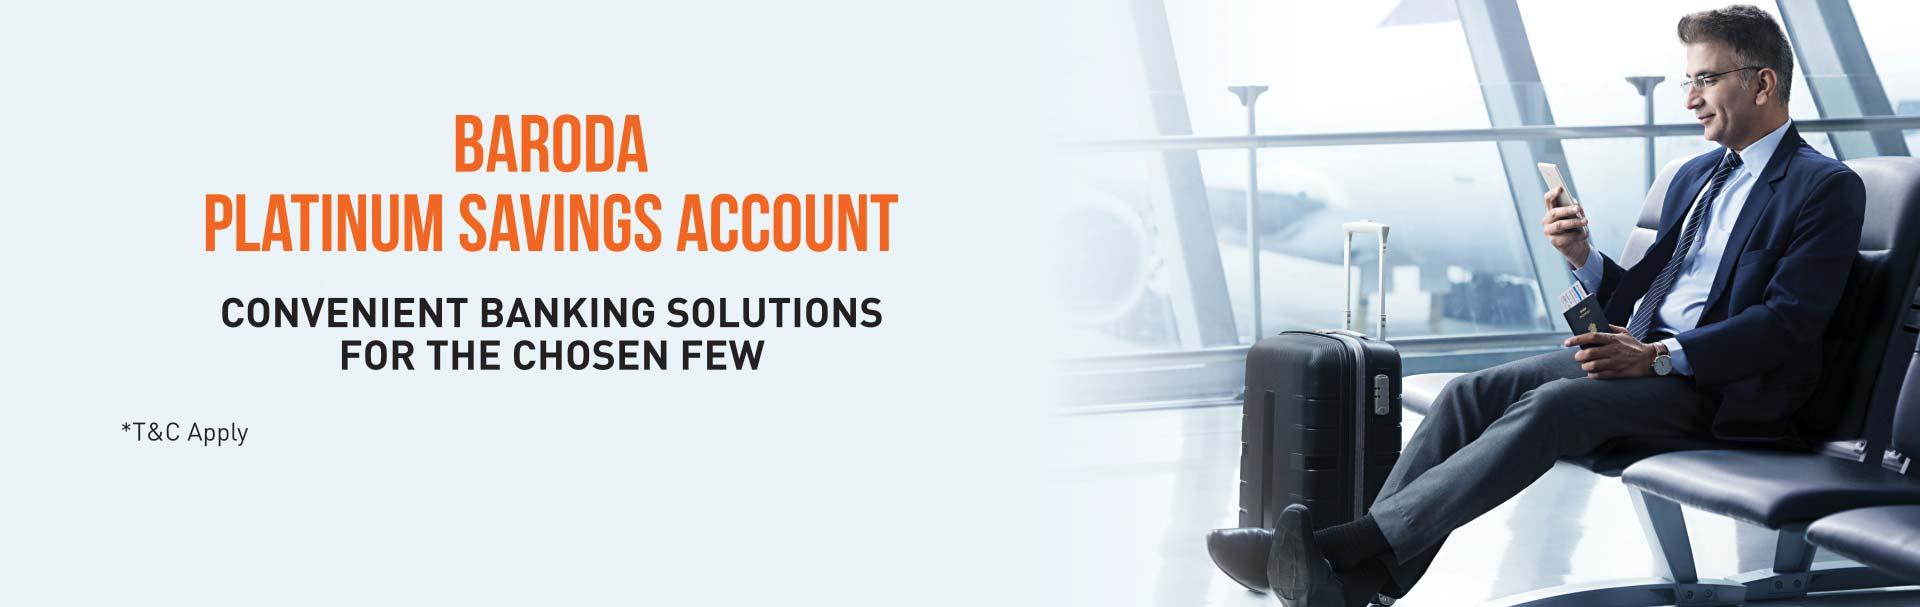 Baroda Platinum Saving Bank Account